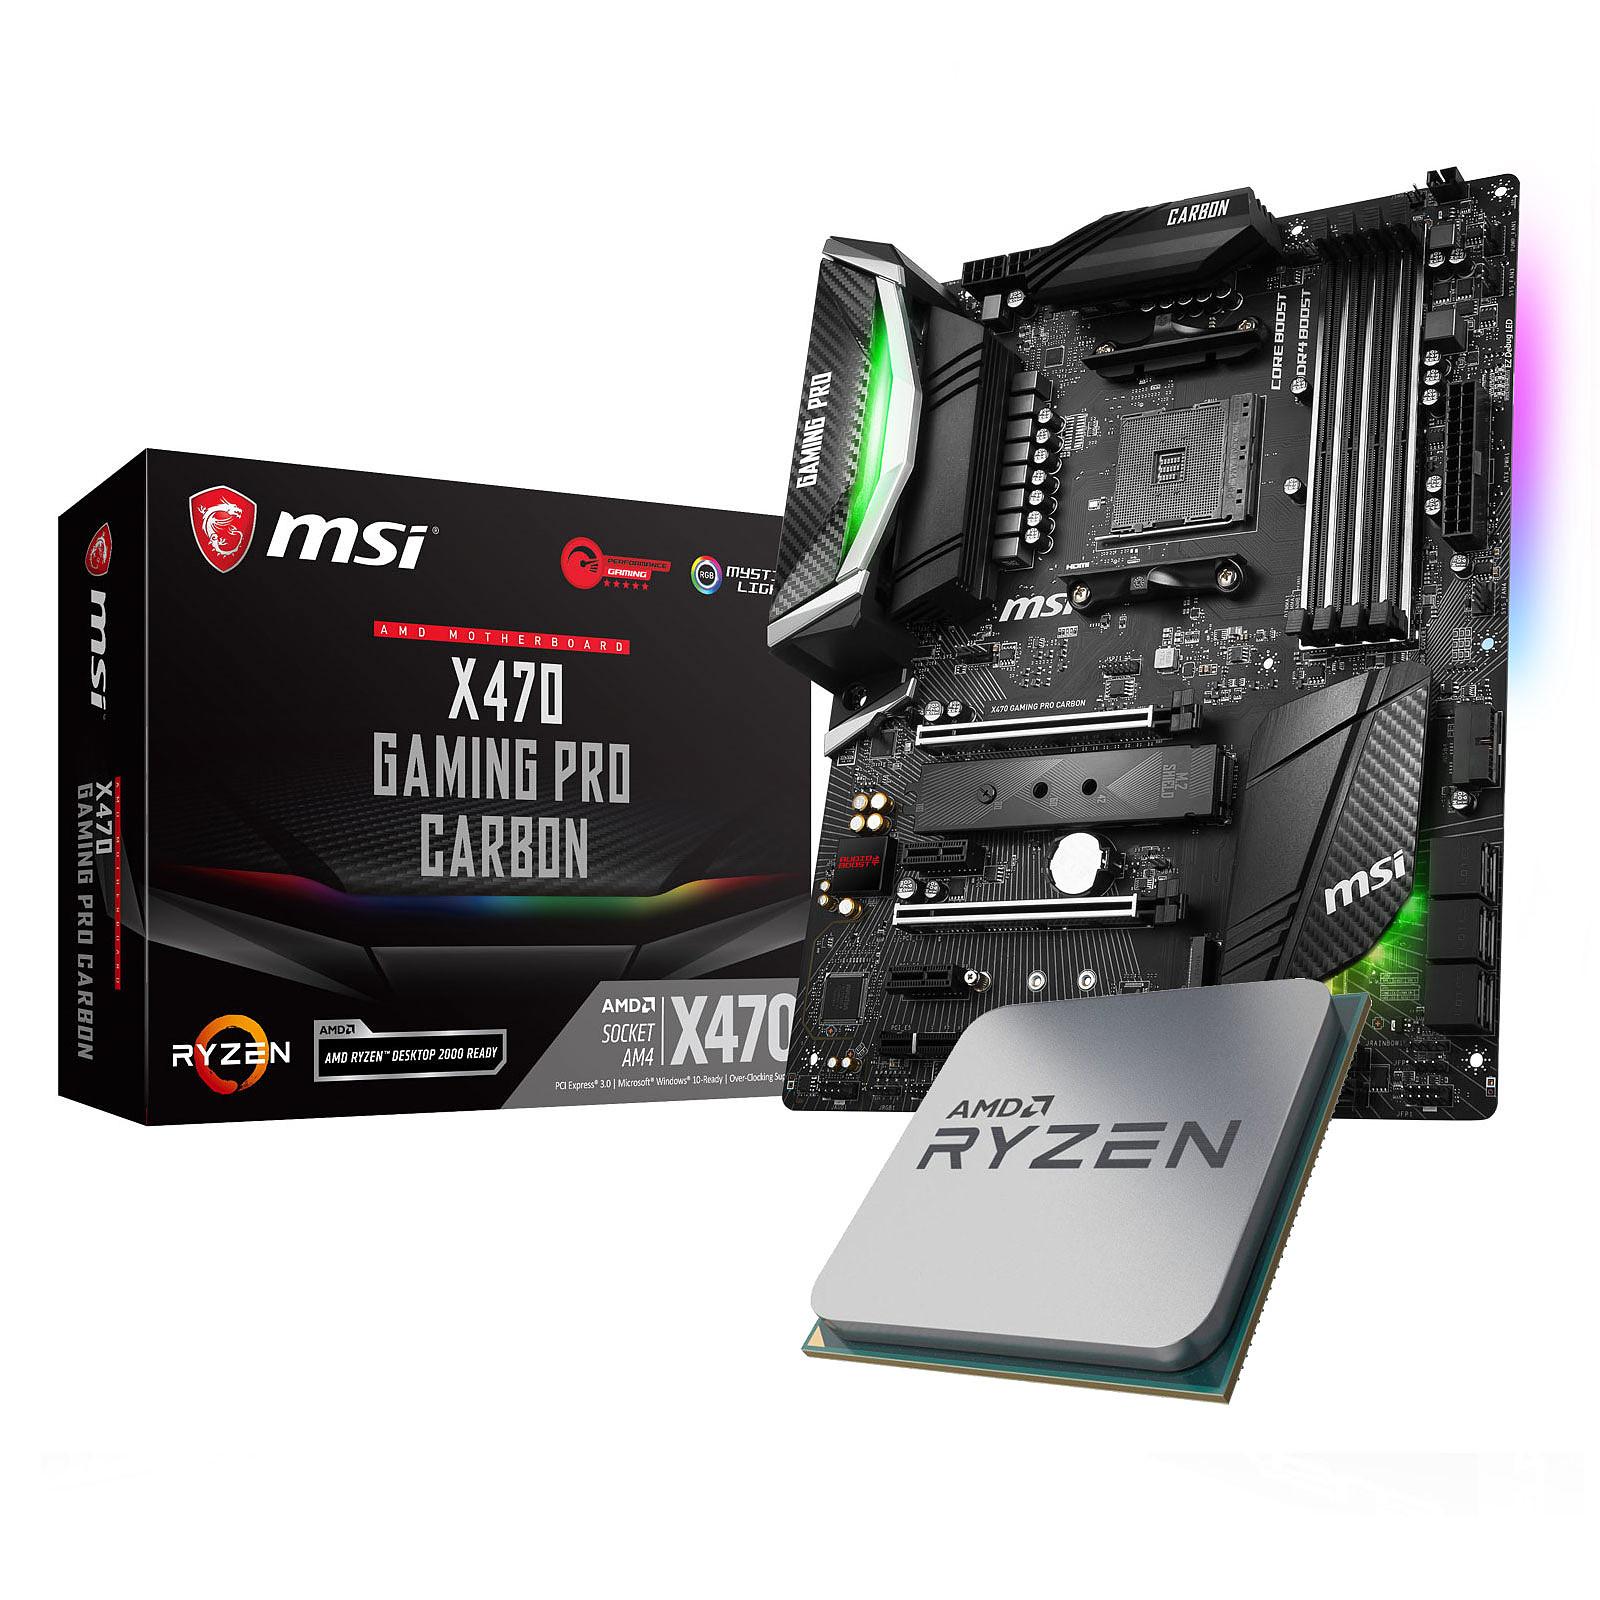 Kit Upgrade PC AMD Ryzen 5 2600X MSI X470 GAMING PRO CARBON